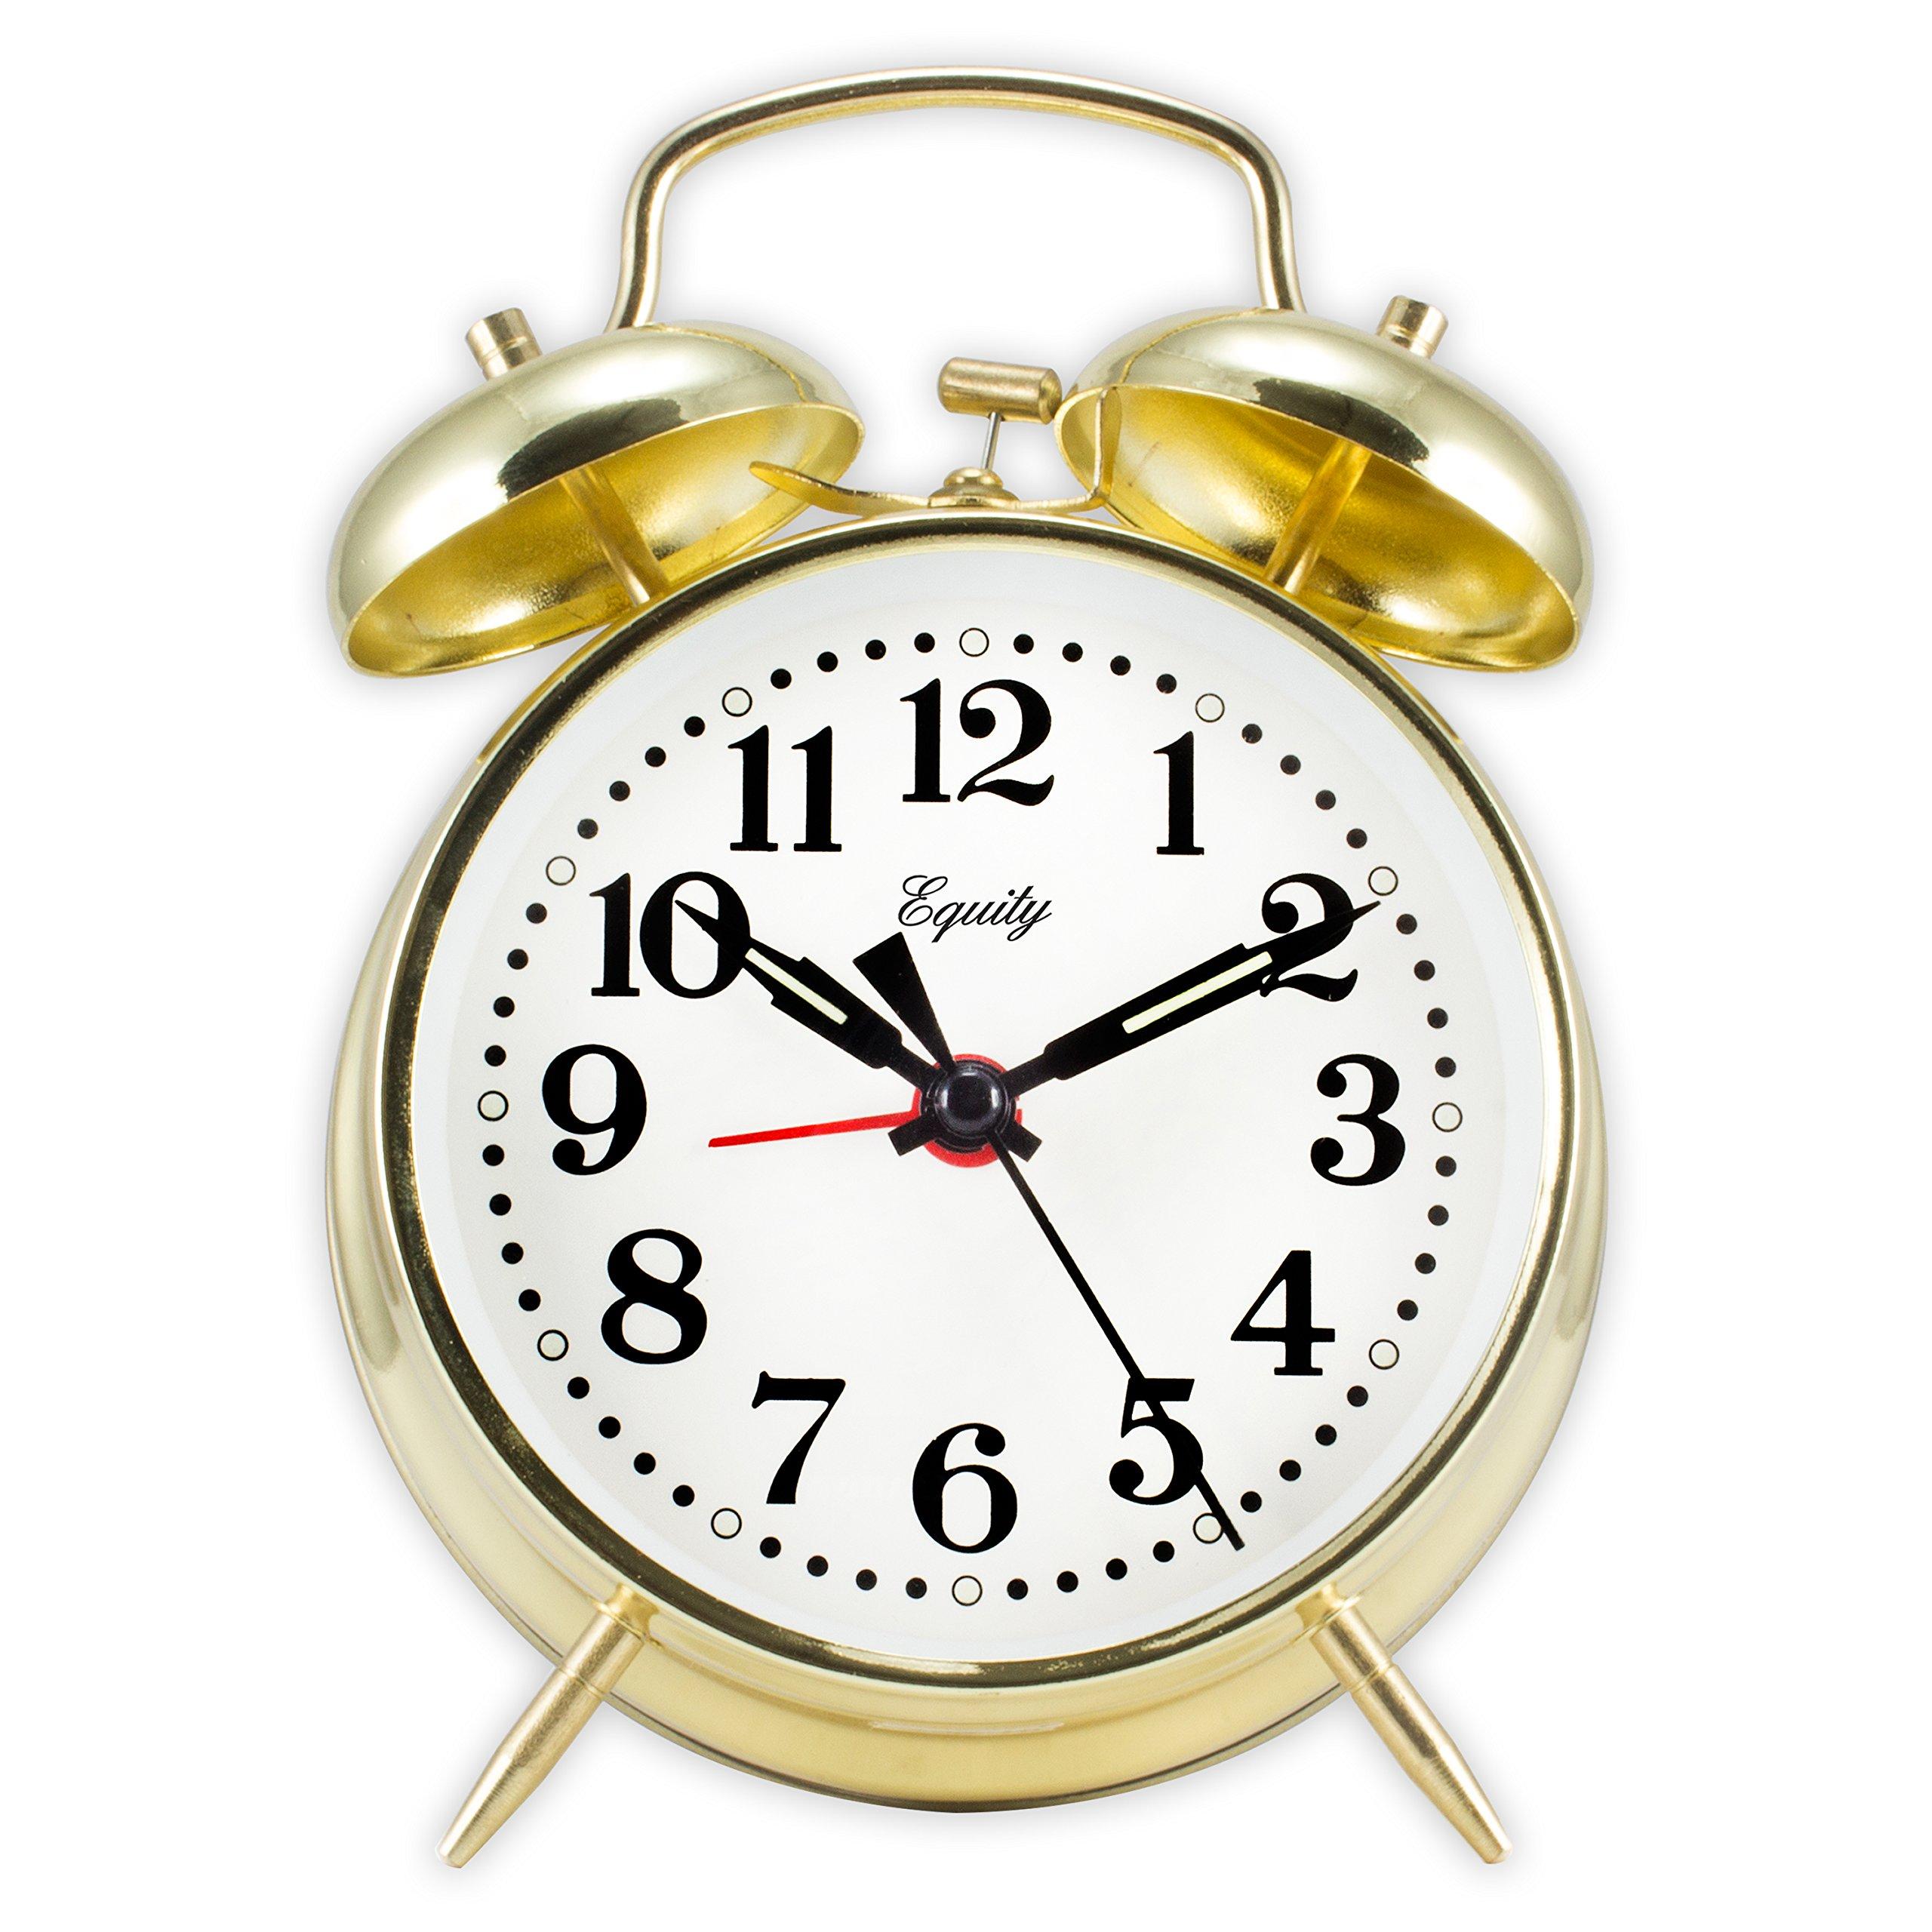 Equity by La Crosse 13012 Twinbell Alarm Clock